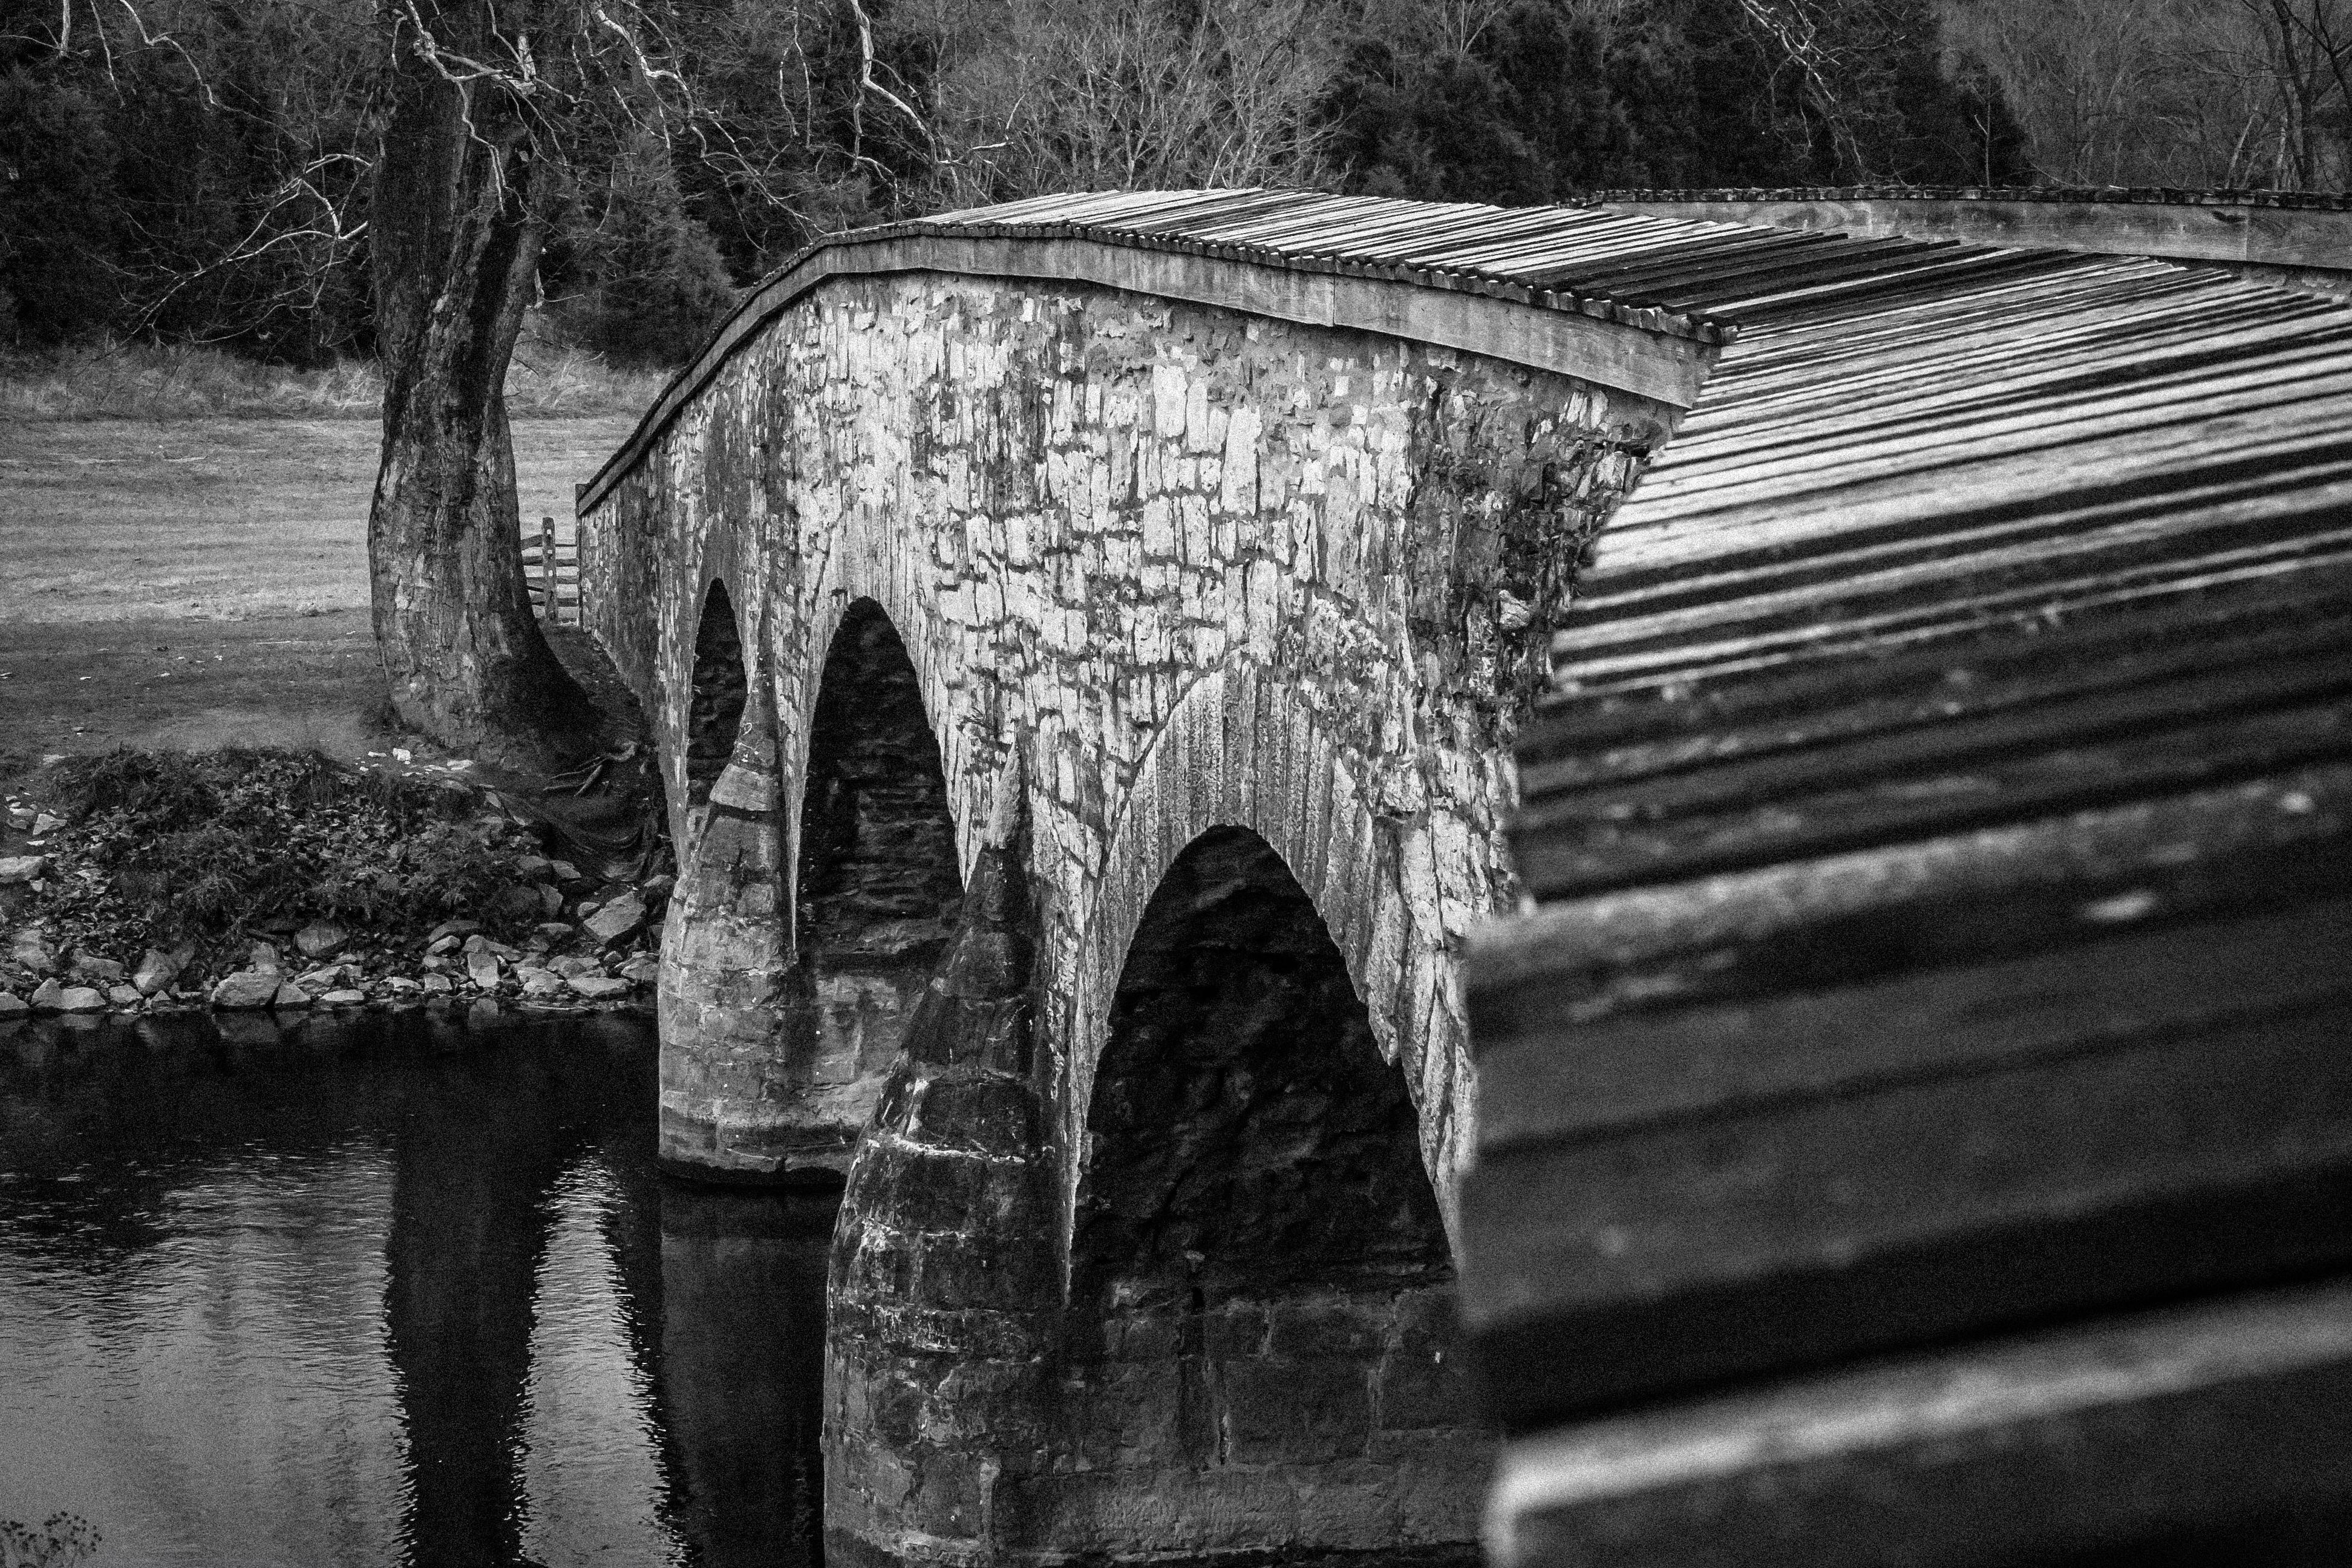 Burnside Bridge Antietam Battlefield Shutterbug